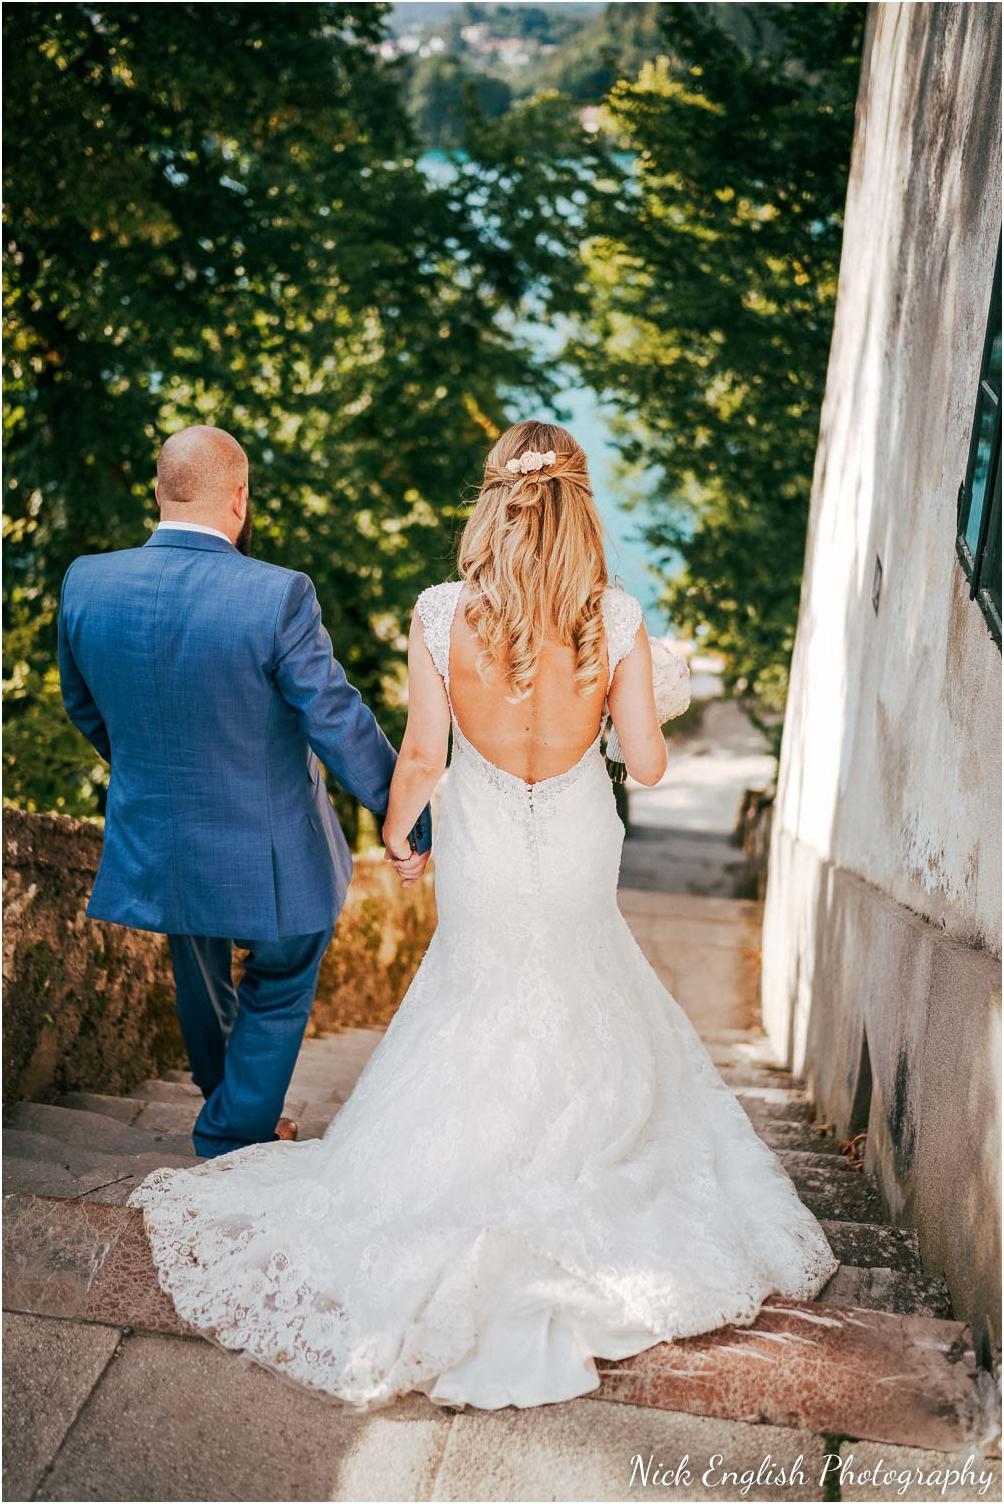 Destination_Wedding_Photographer_Slovenia_Nick_English_Photography-70-21.jpg